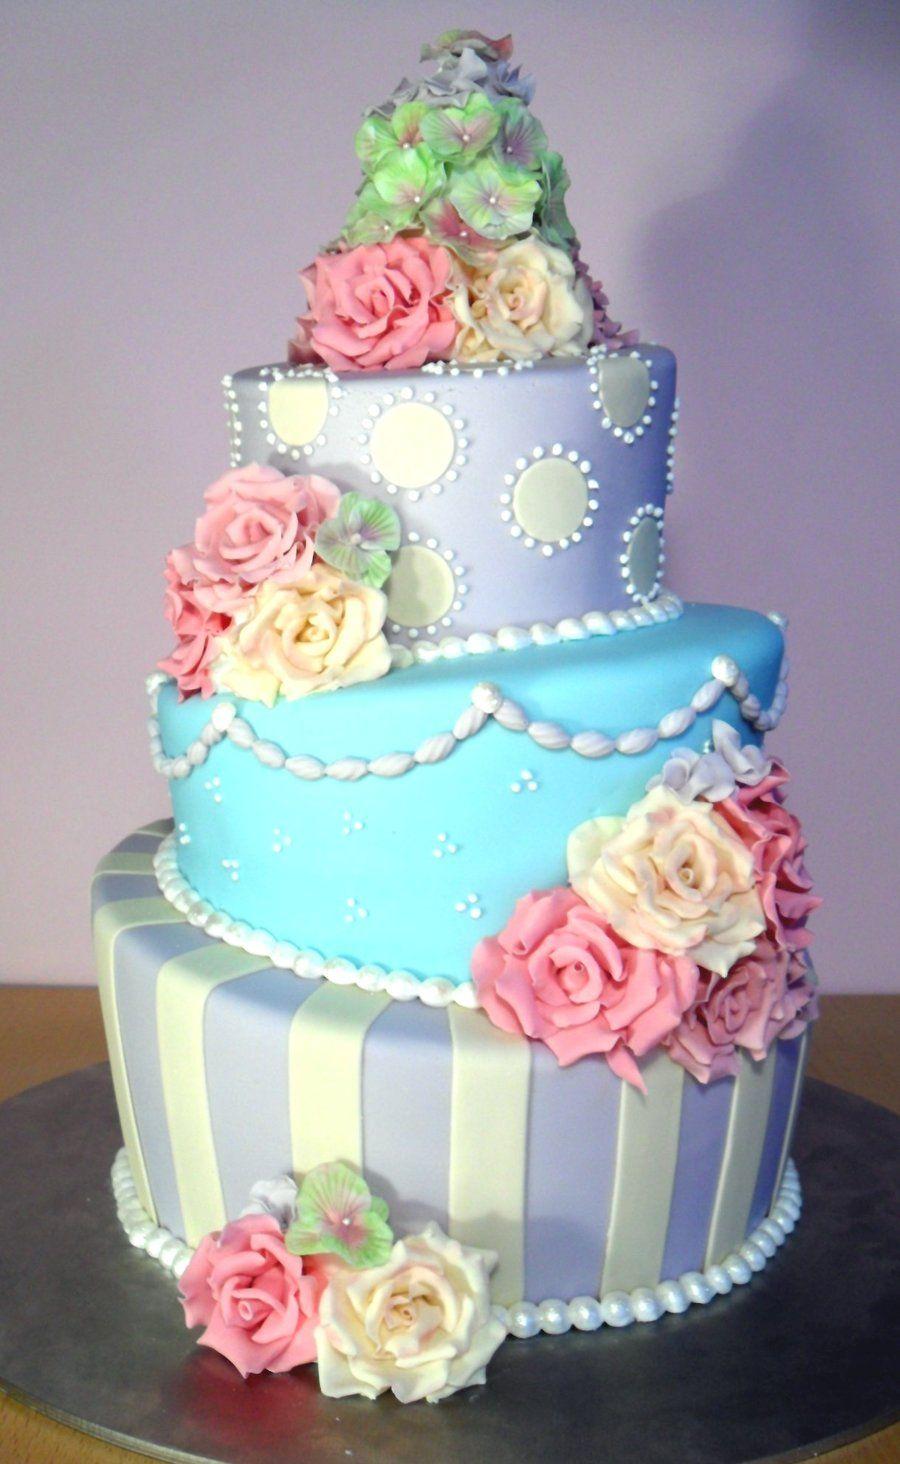 Umidit topsy turvy wedding cake sweet menu pinterest